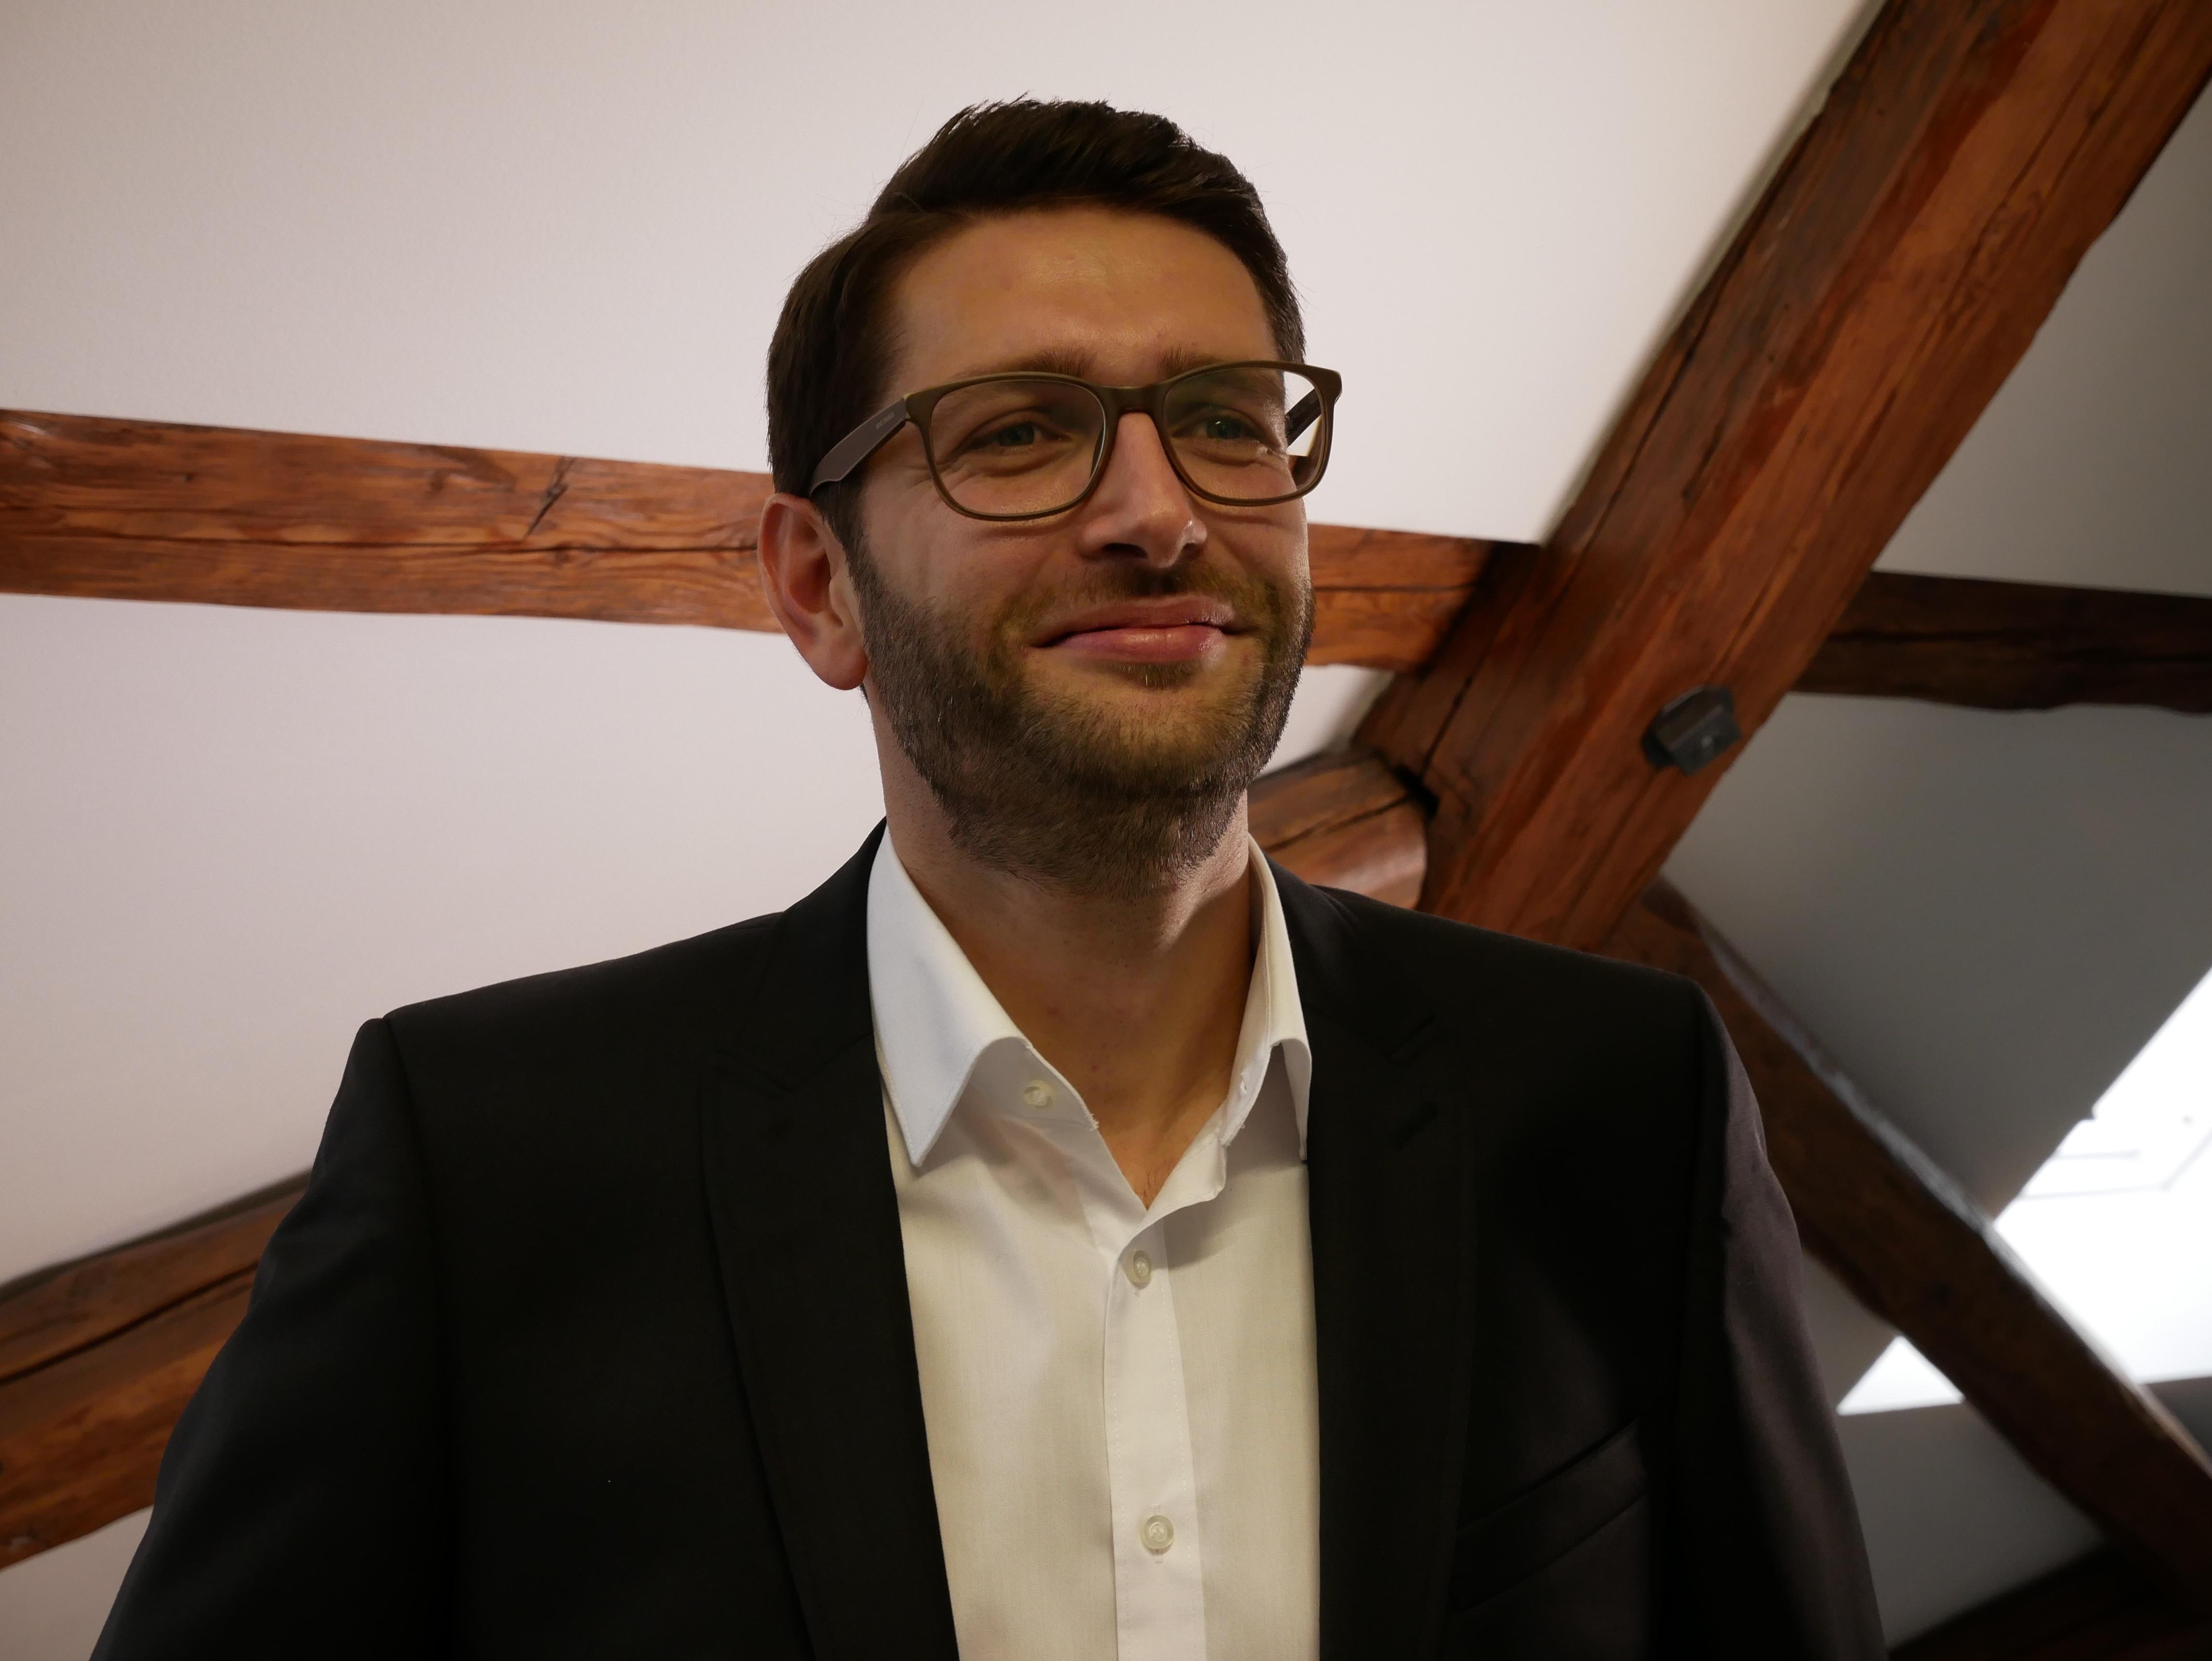 Thomas Weigl